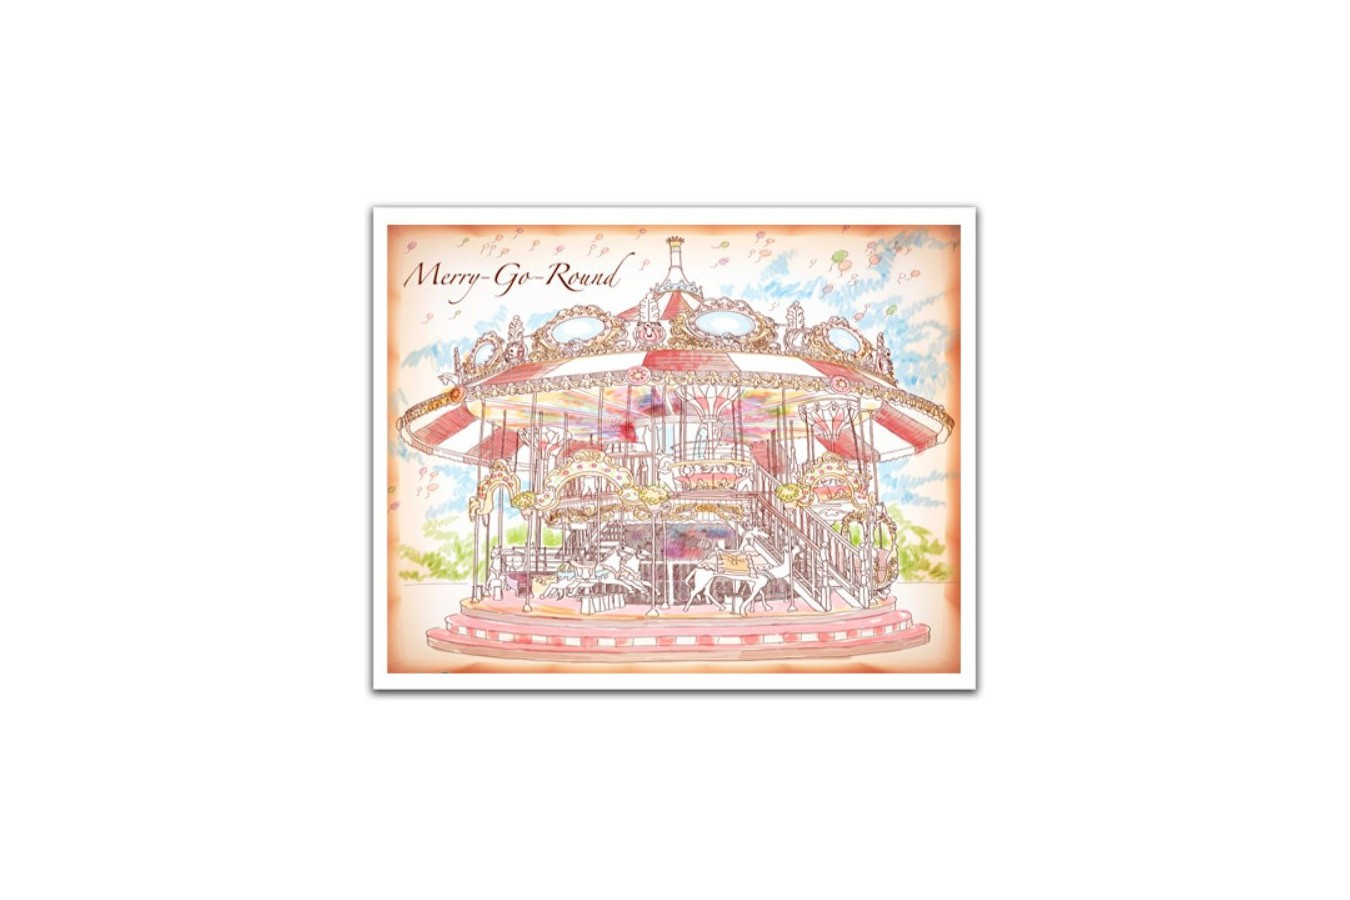 Puzzle din plastic Pintoo - Merry Go Round, 500 piese (H1545) imagine